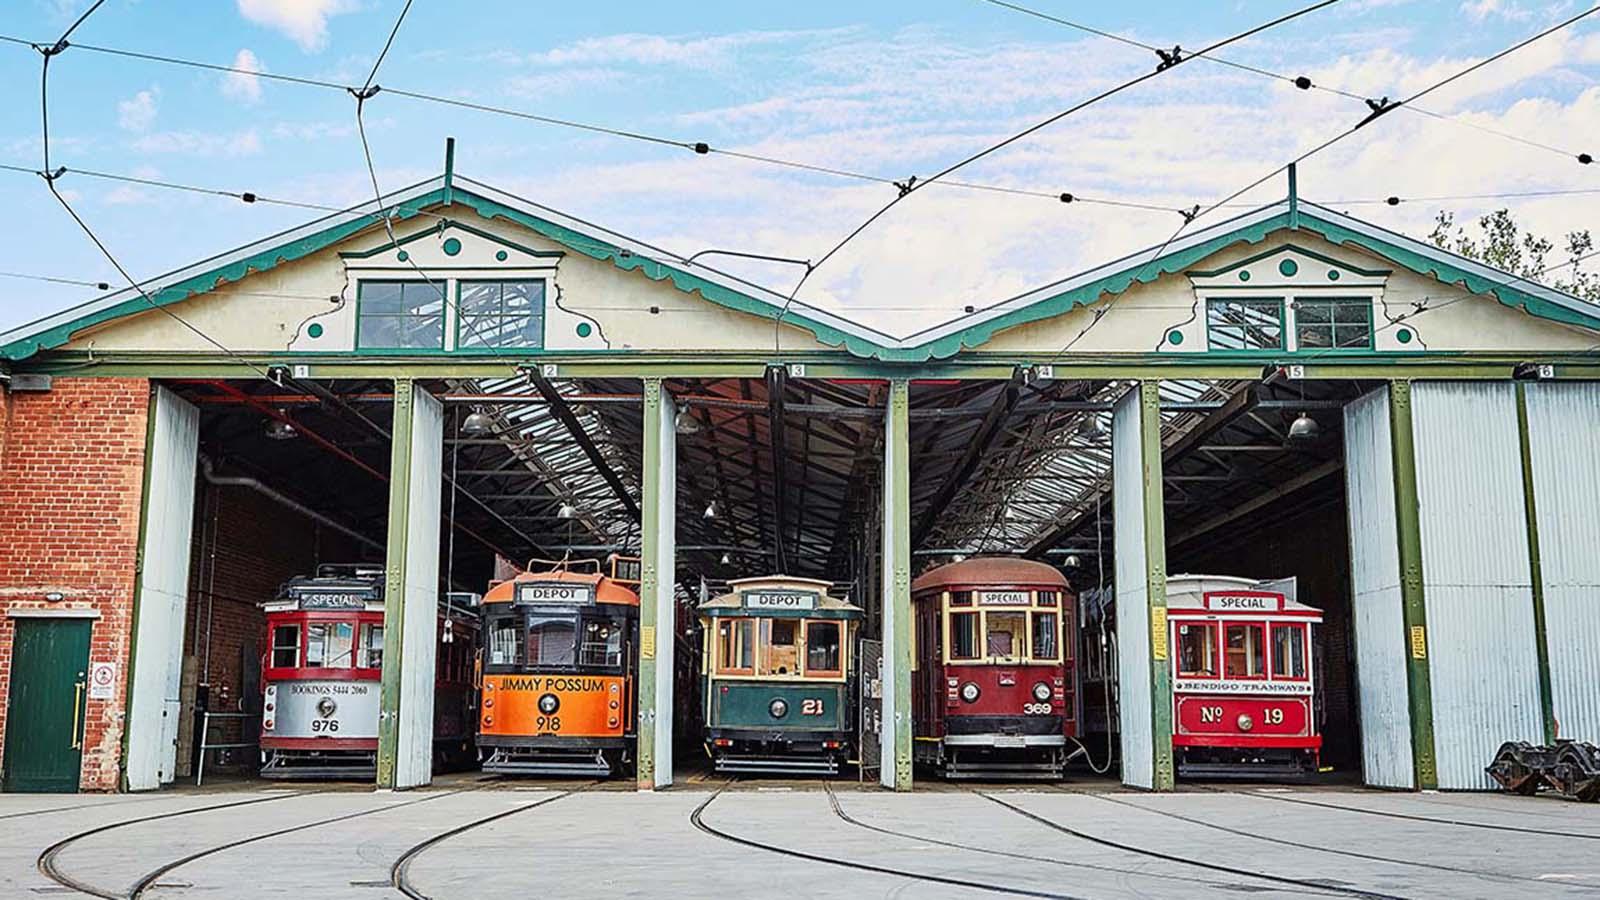 Bendigo Tramways, Bendigo, Golfields, Victoria, Australia